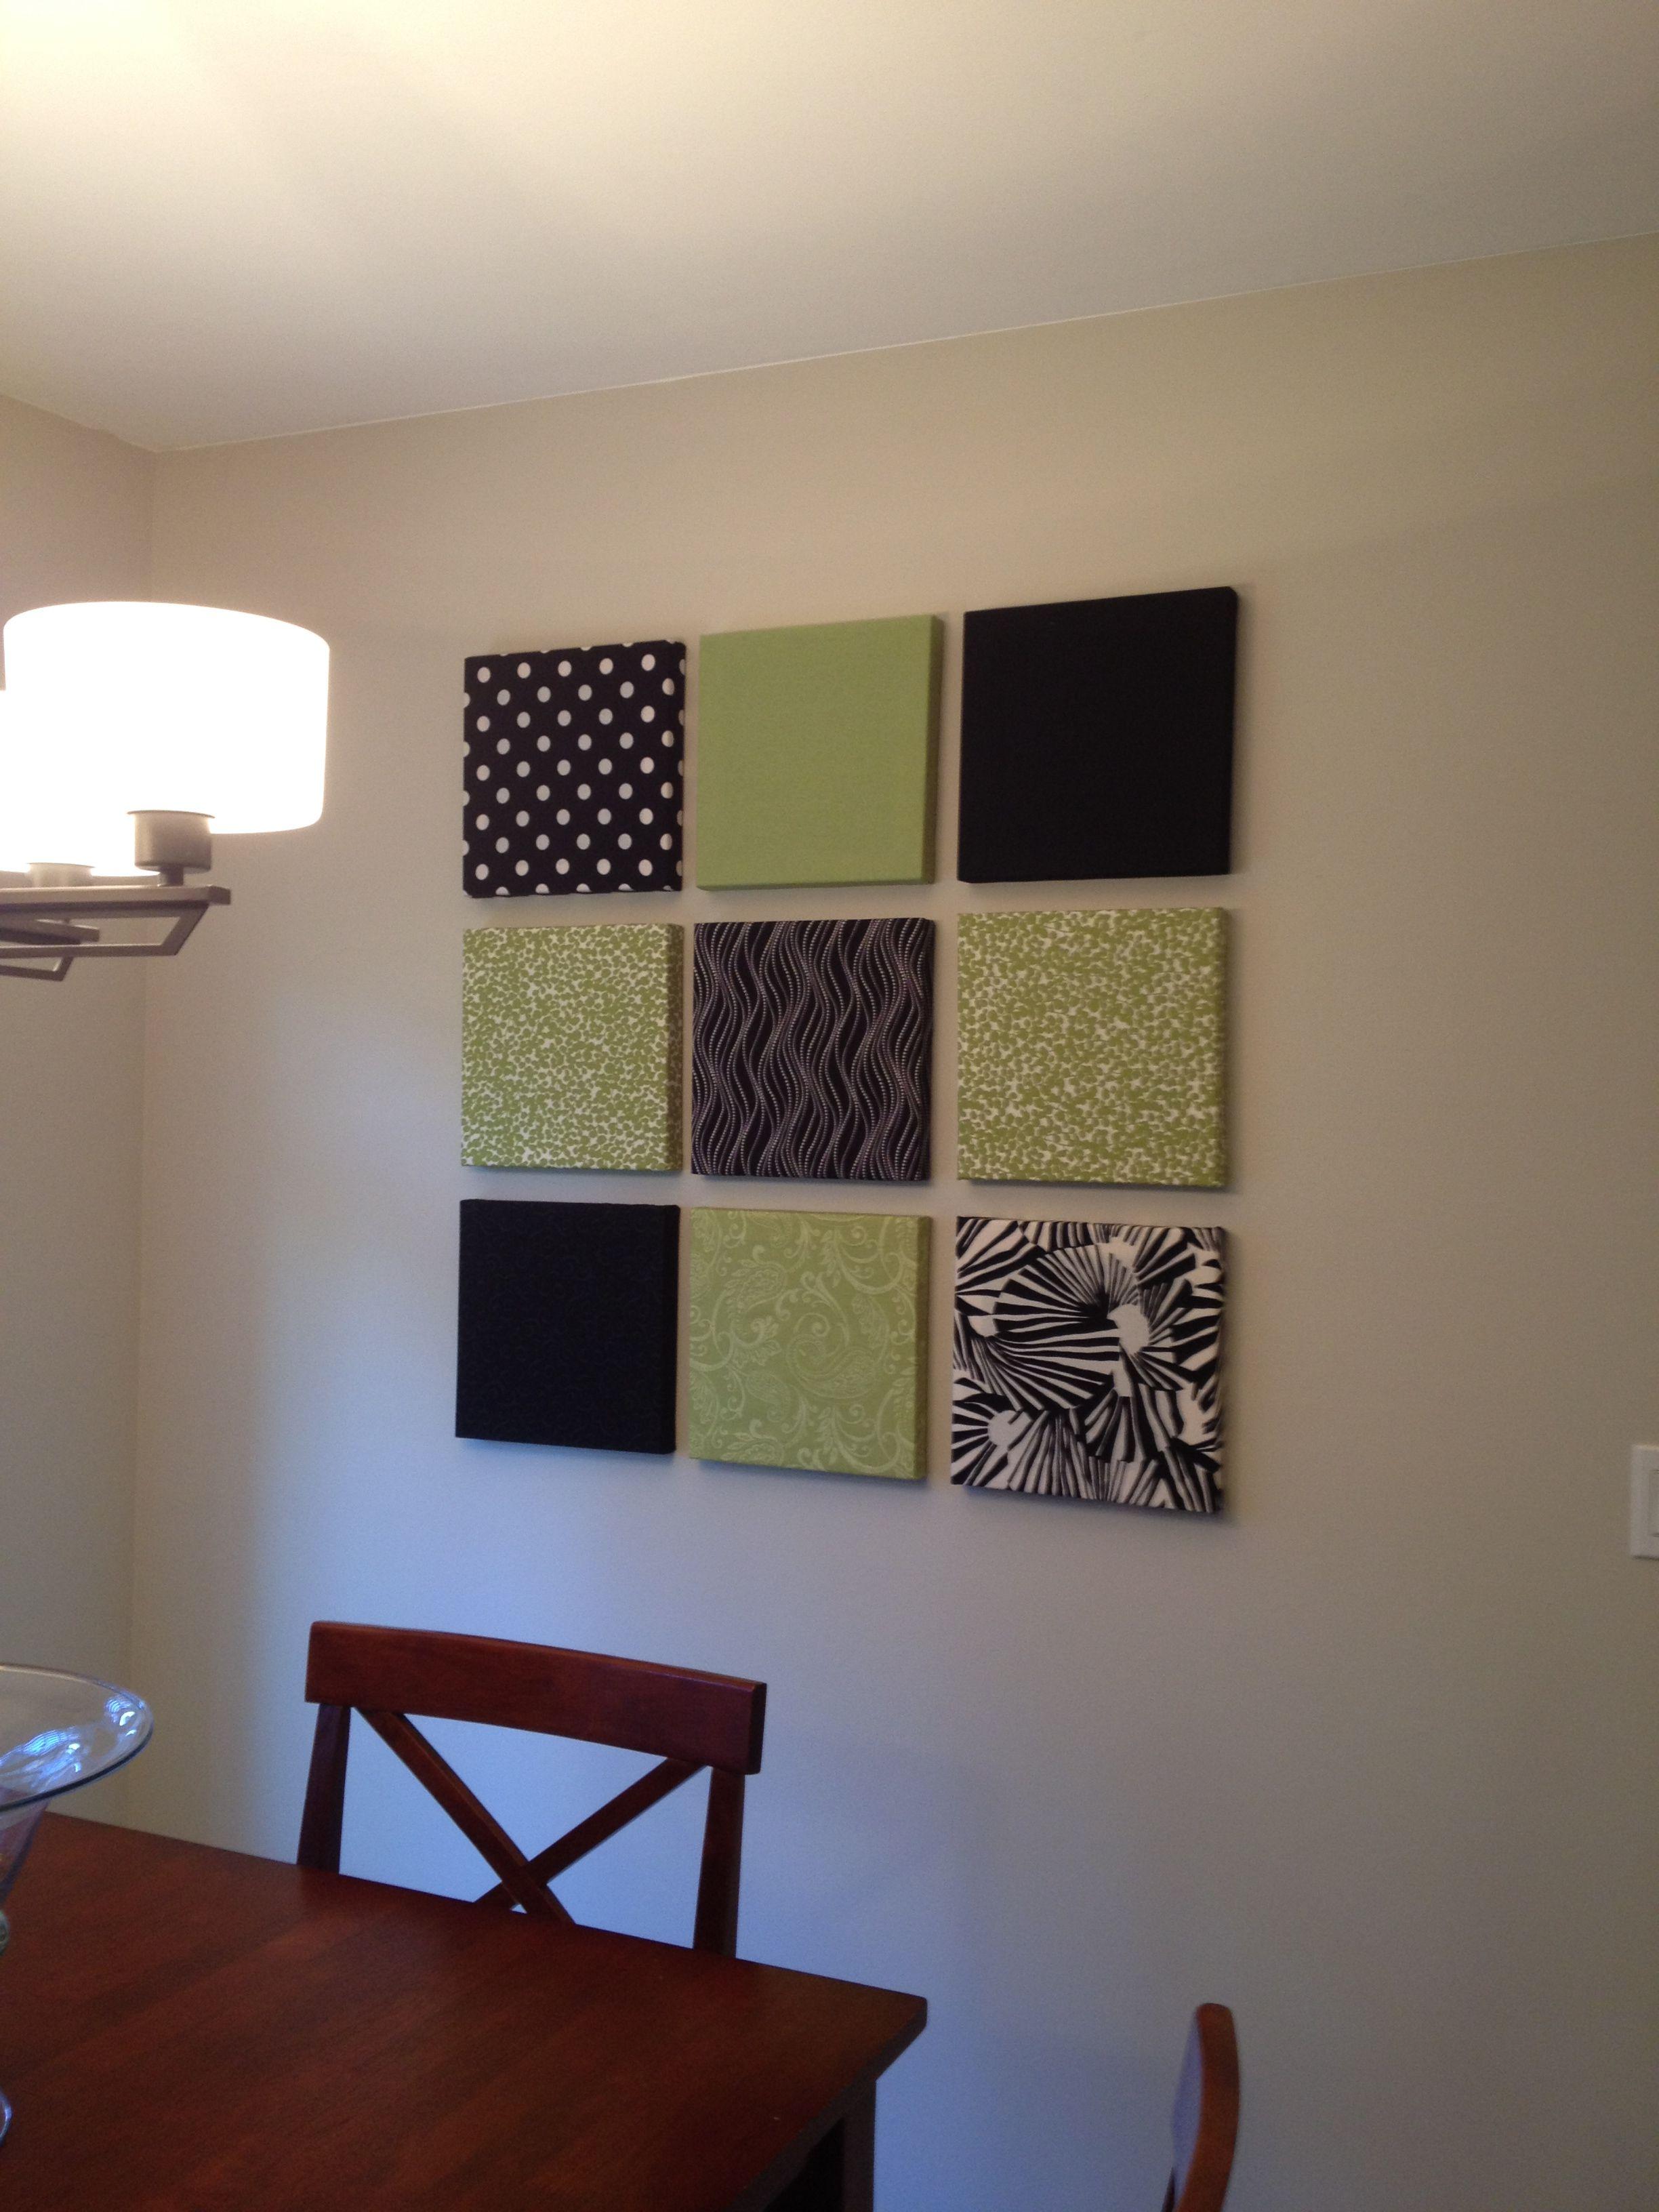 wall decor | Home Ideas | Pinterest on Pinterest Wall Decor  id=24484